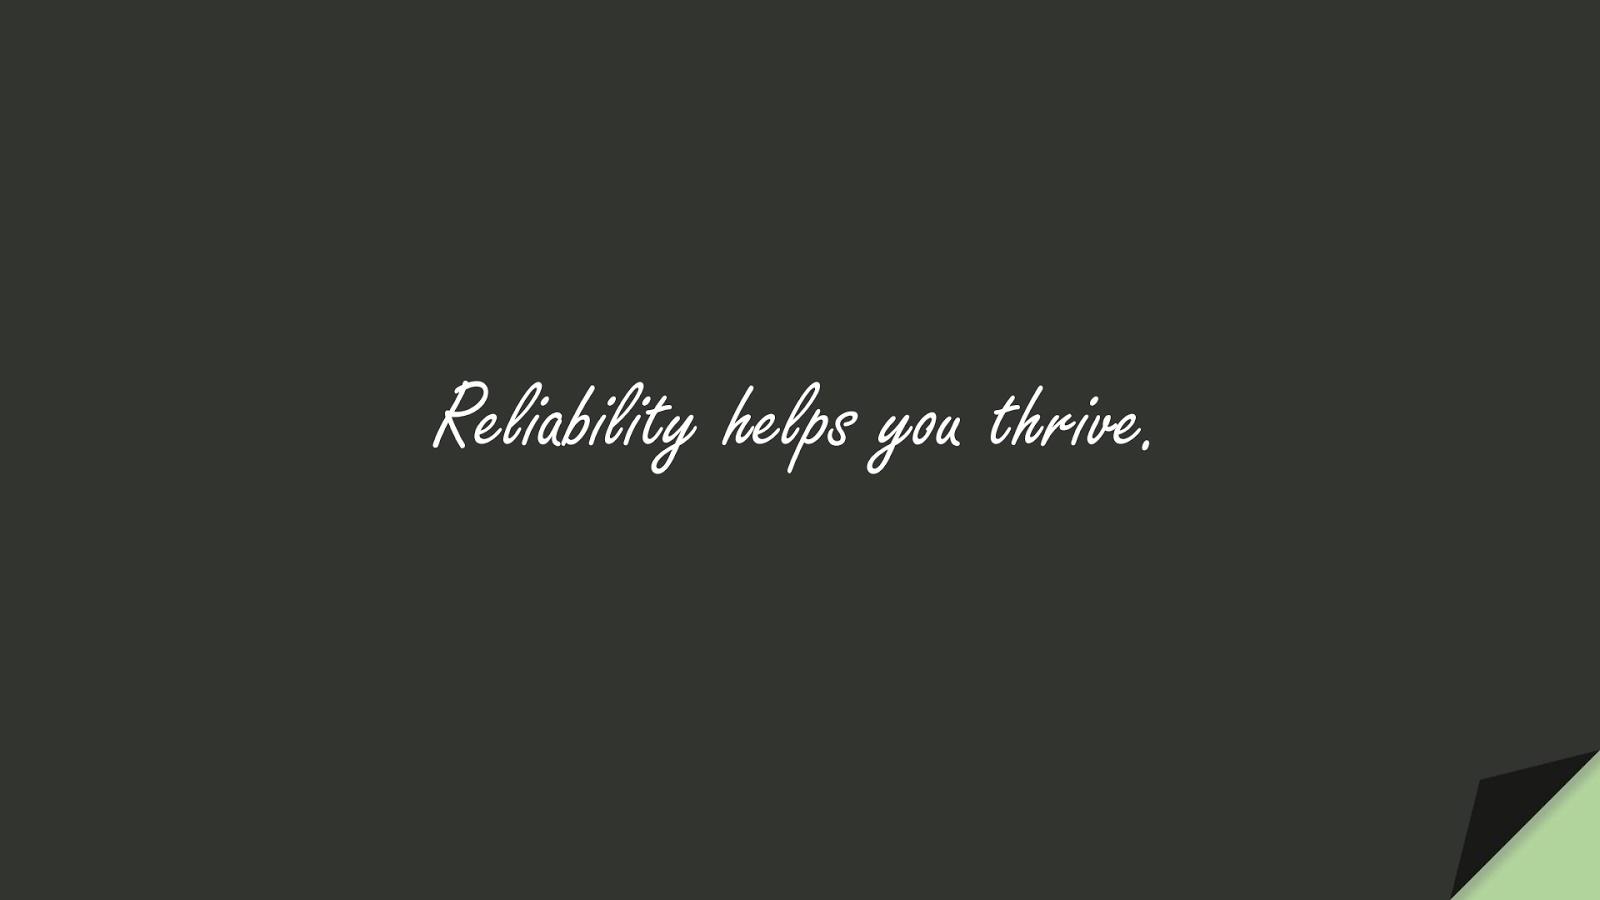 Reliability helps you thrive.FALSE